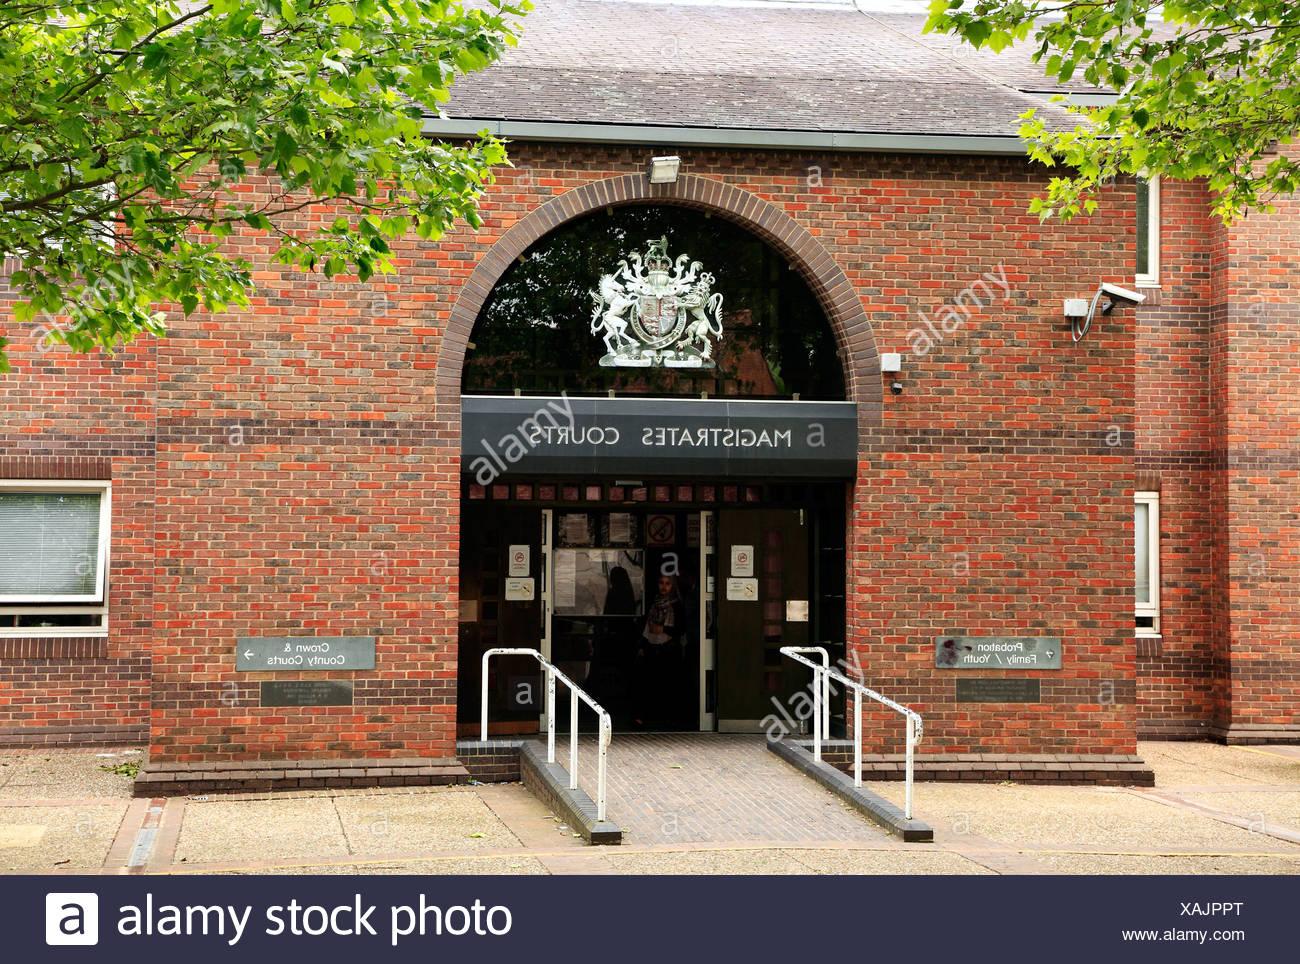 Norwich Magistrates Courts, Amtsgericht Recht Eingang, Norfolk England UK englische Gerichte Stockbild